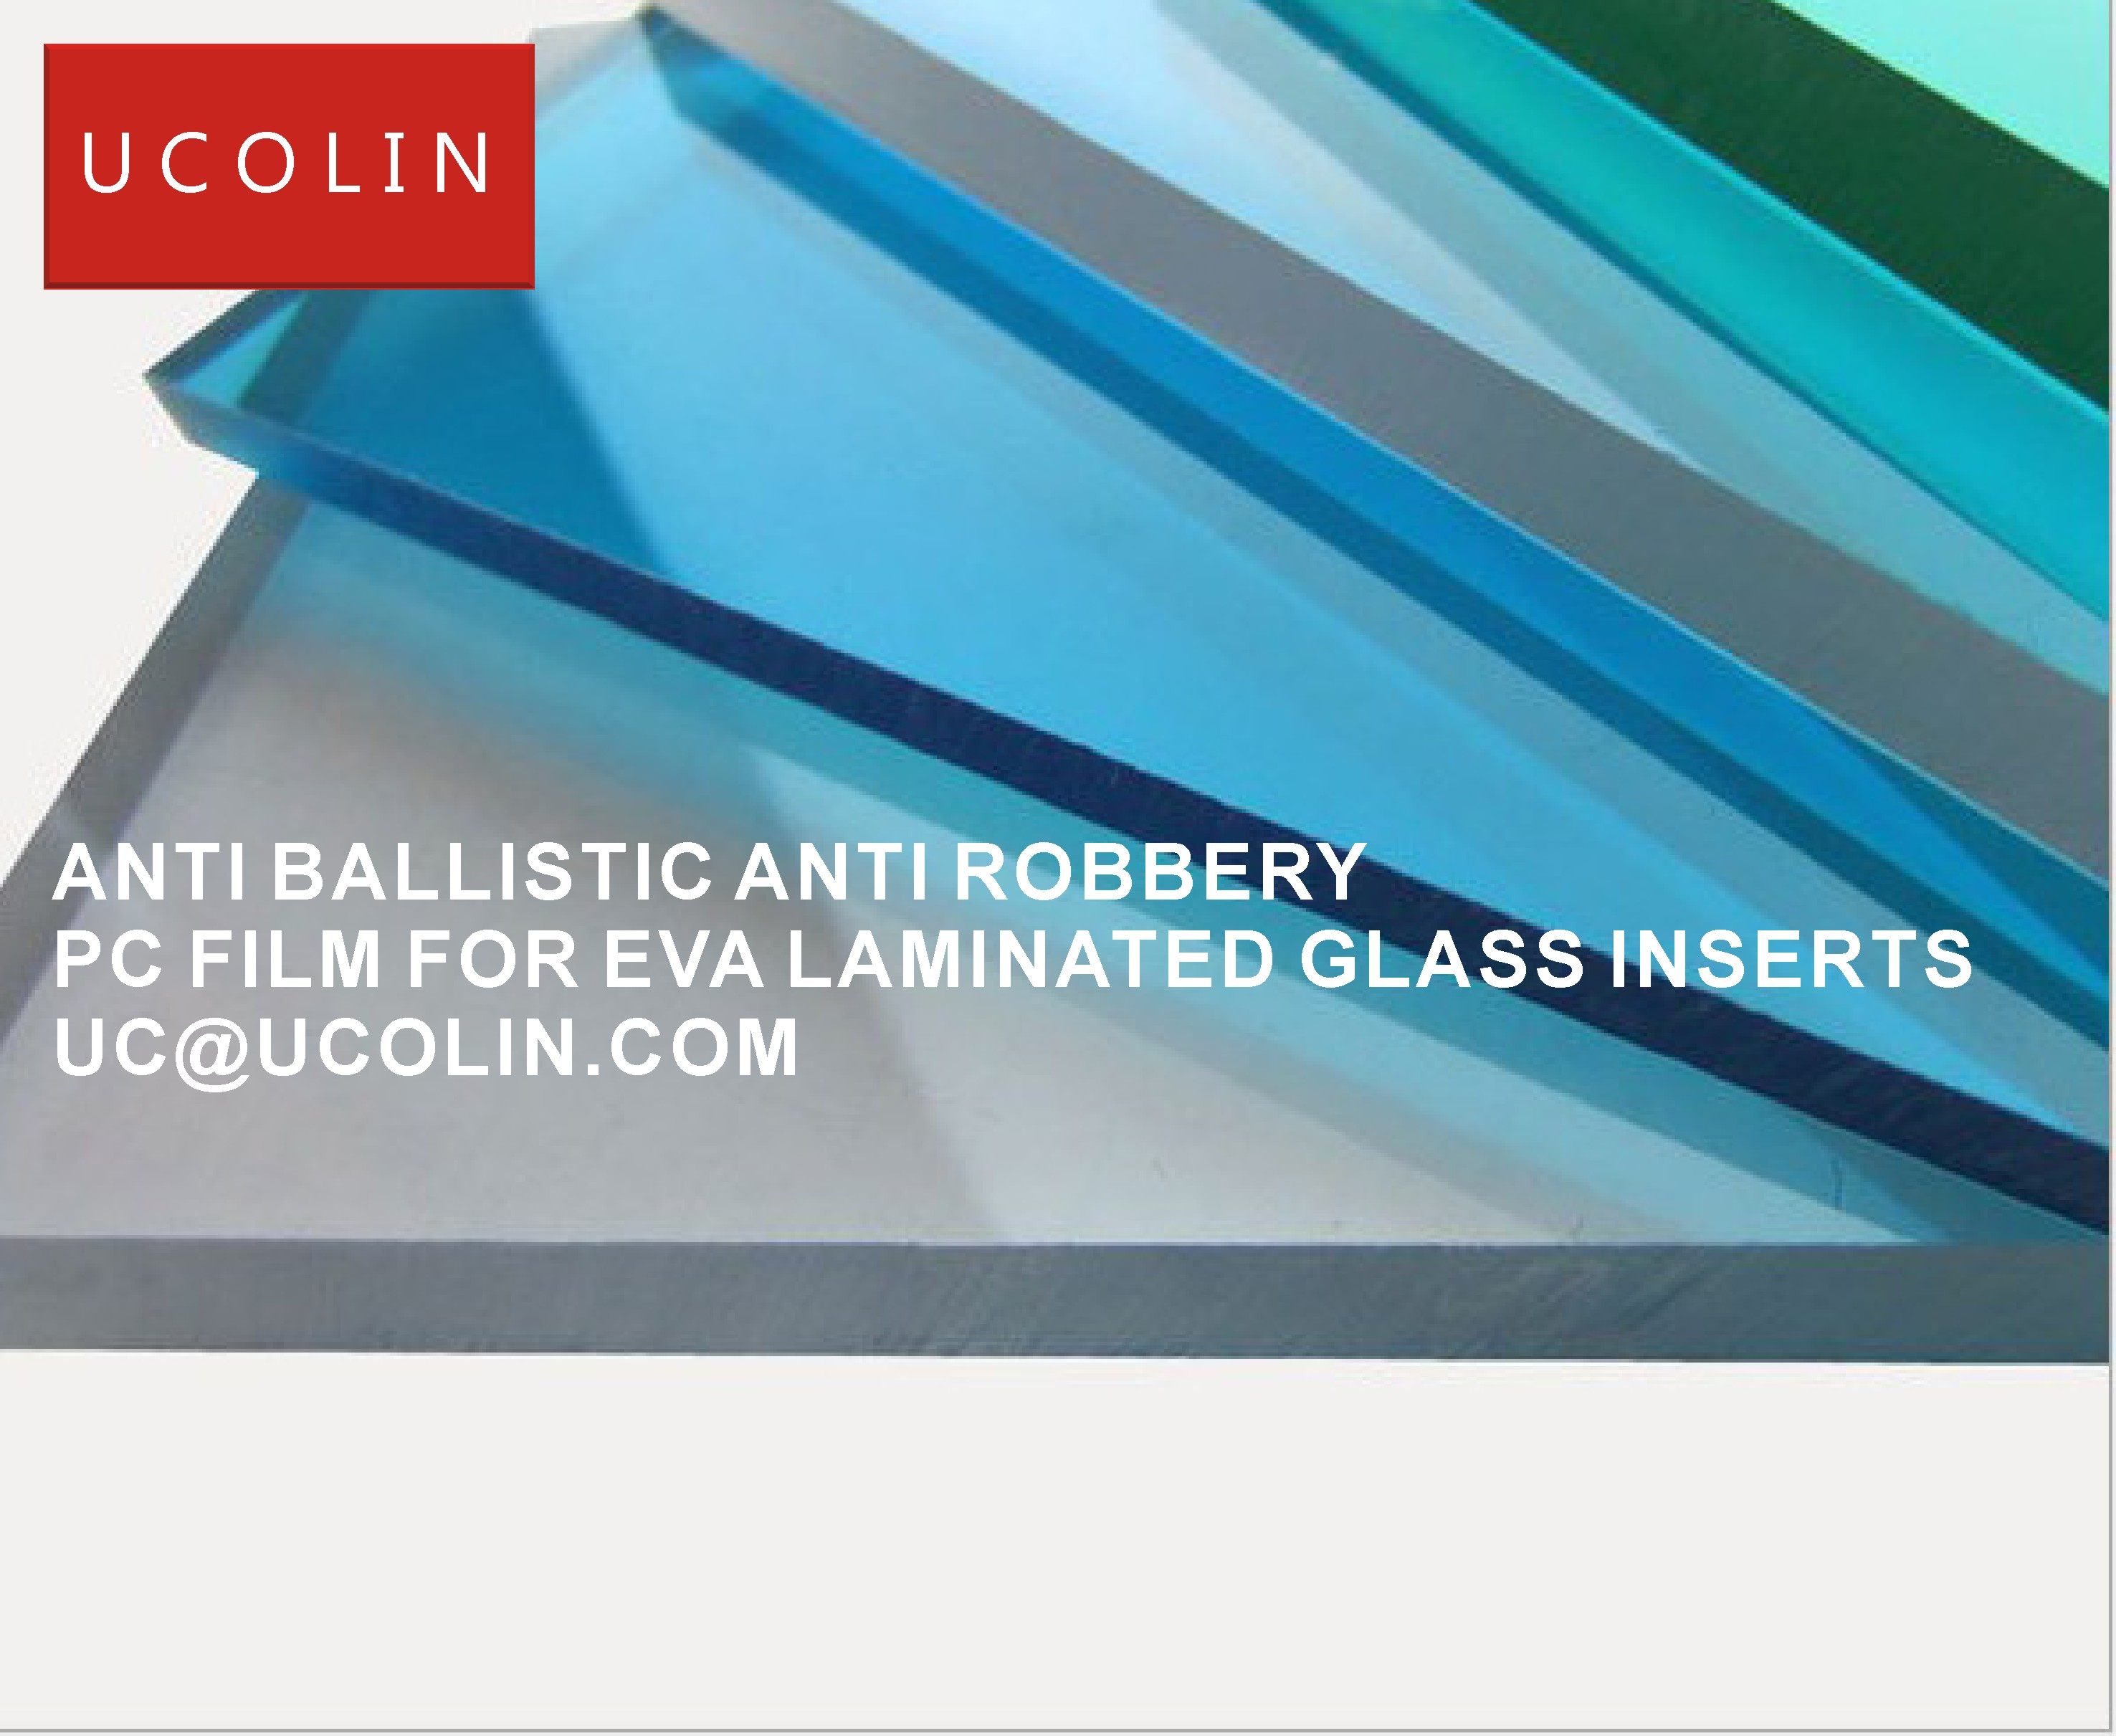 04 ANTI BALLISTIC ANTI ROBBERY PC FILM FOR EVA LAMINATED GLASS INERTS